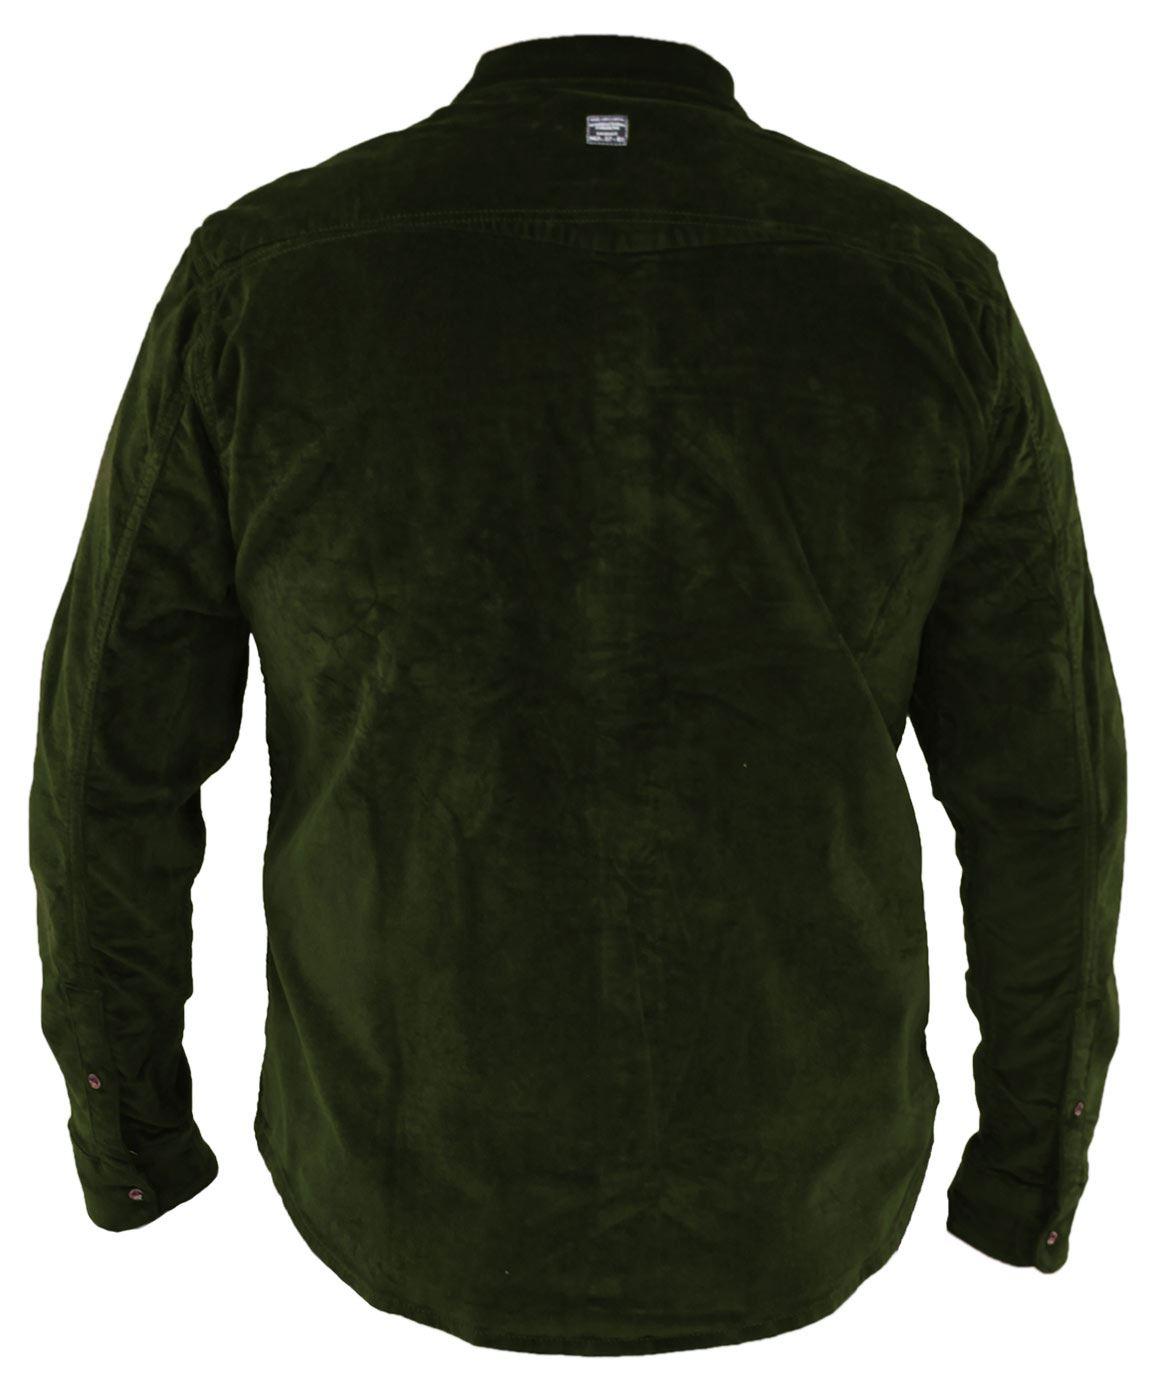 Mens-Corduroy-Cotton-Shirt-Long-Sleeve-Casual-Shirts-Jacksouth-Jacket-Top-S-2XL thumbnail 21